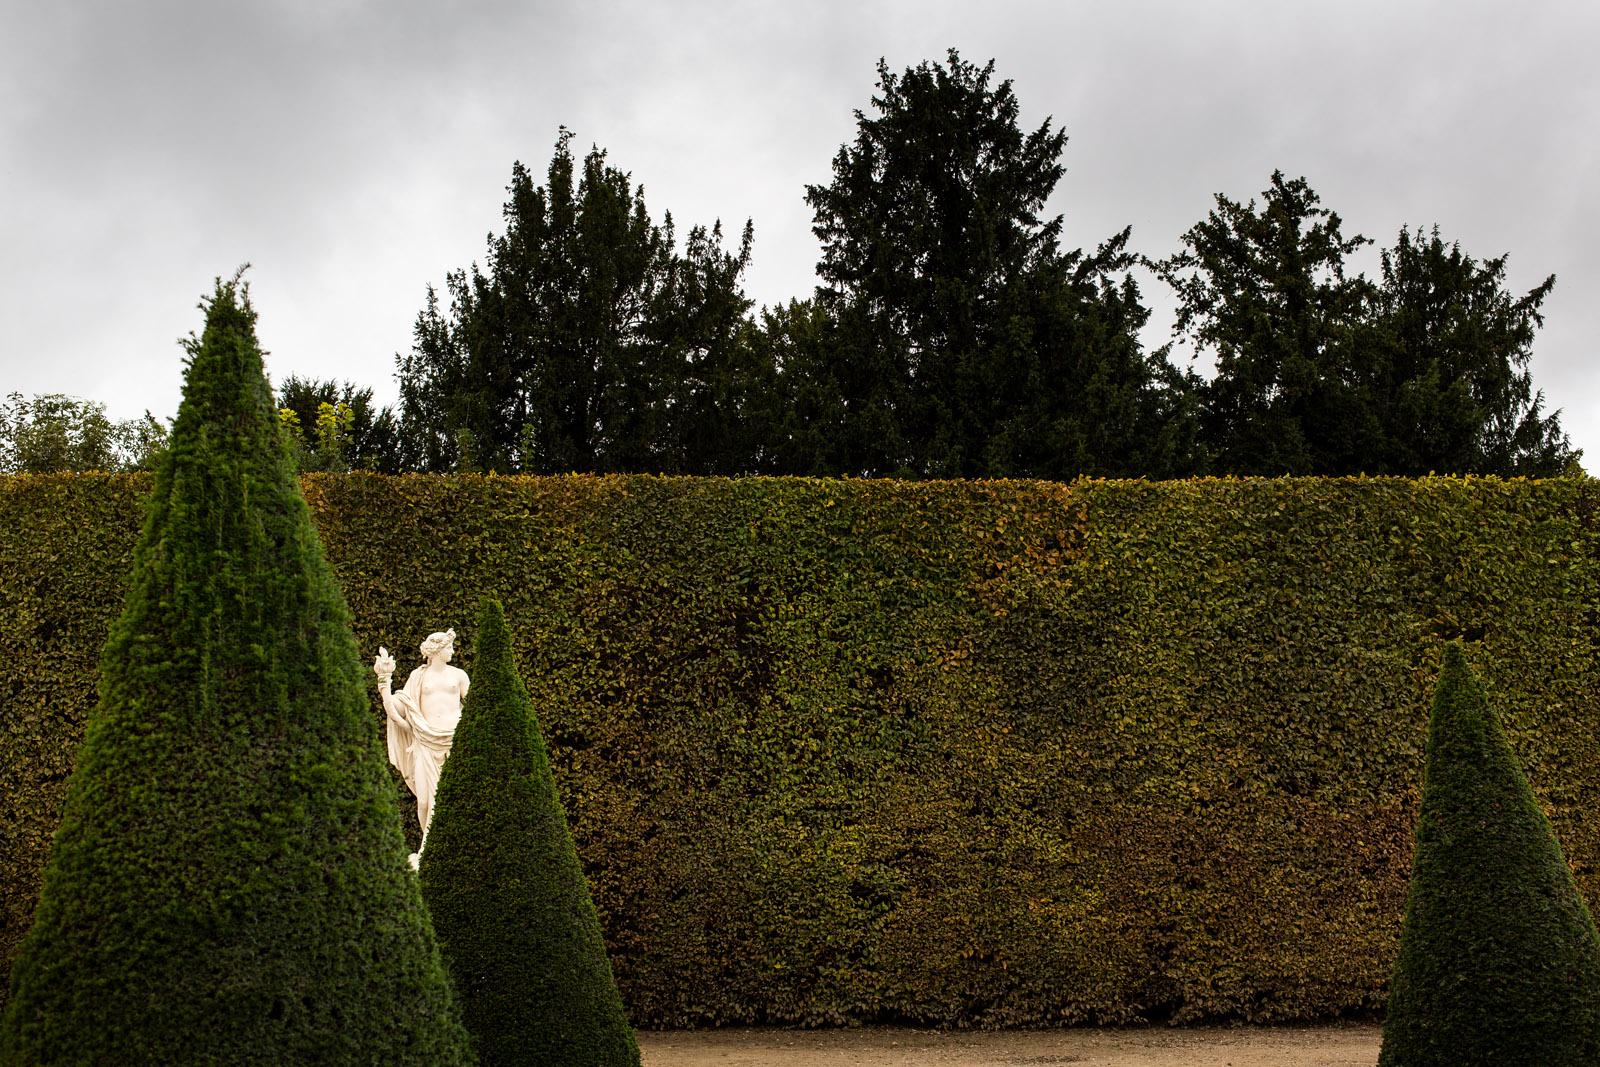 Versailles, France. All rights reserved © Tomas Bertelsen